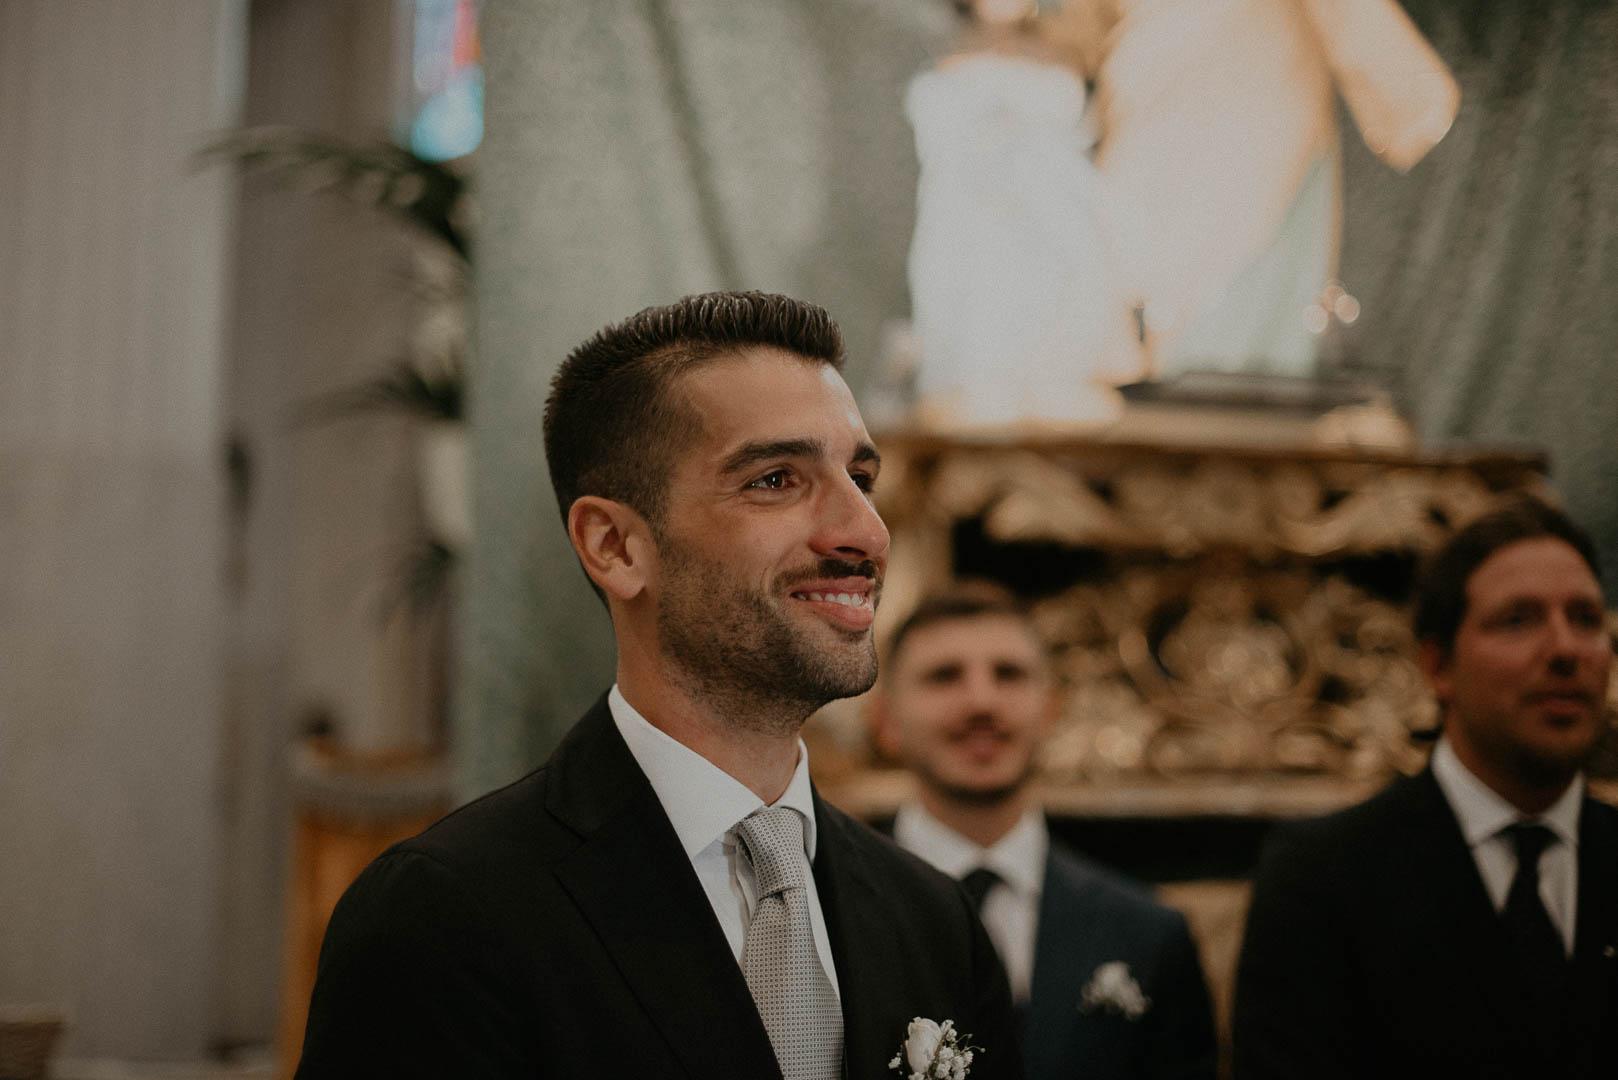 wedding-photographer-destination-fineart-bespoke-reportage-napoli-nabilah-vivianeizzo-spazio46-58